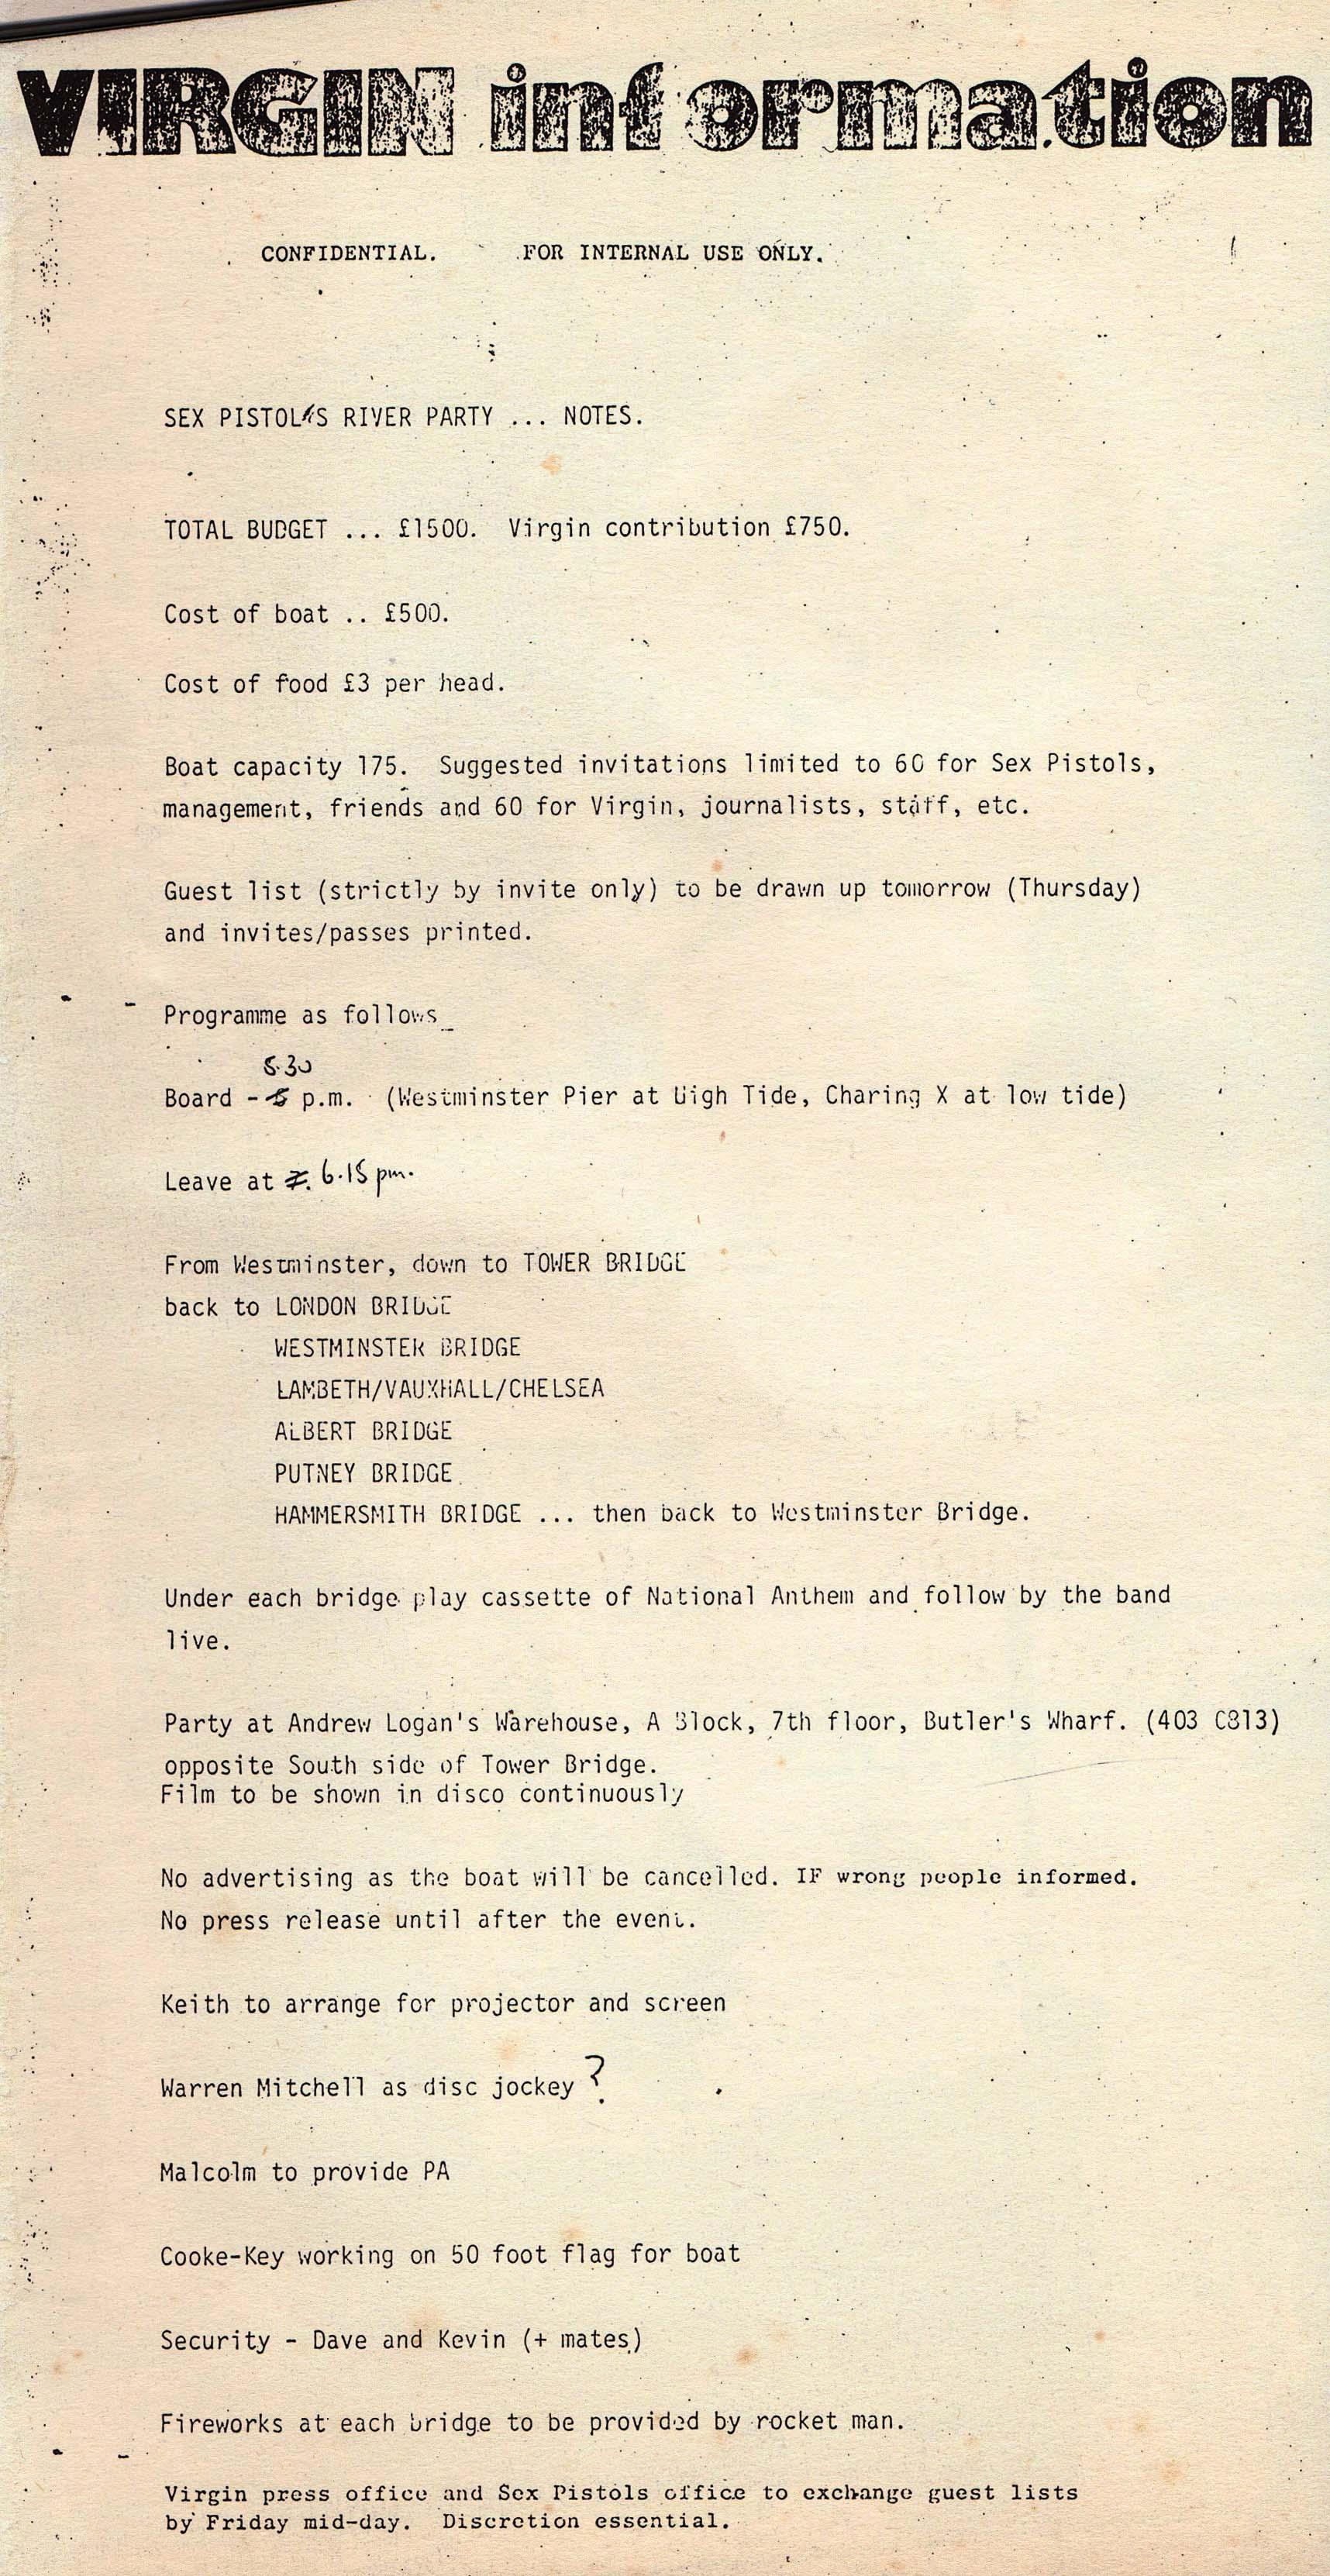 Virgin Records, River Boat Party, June 1977